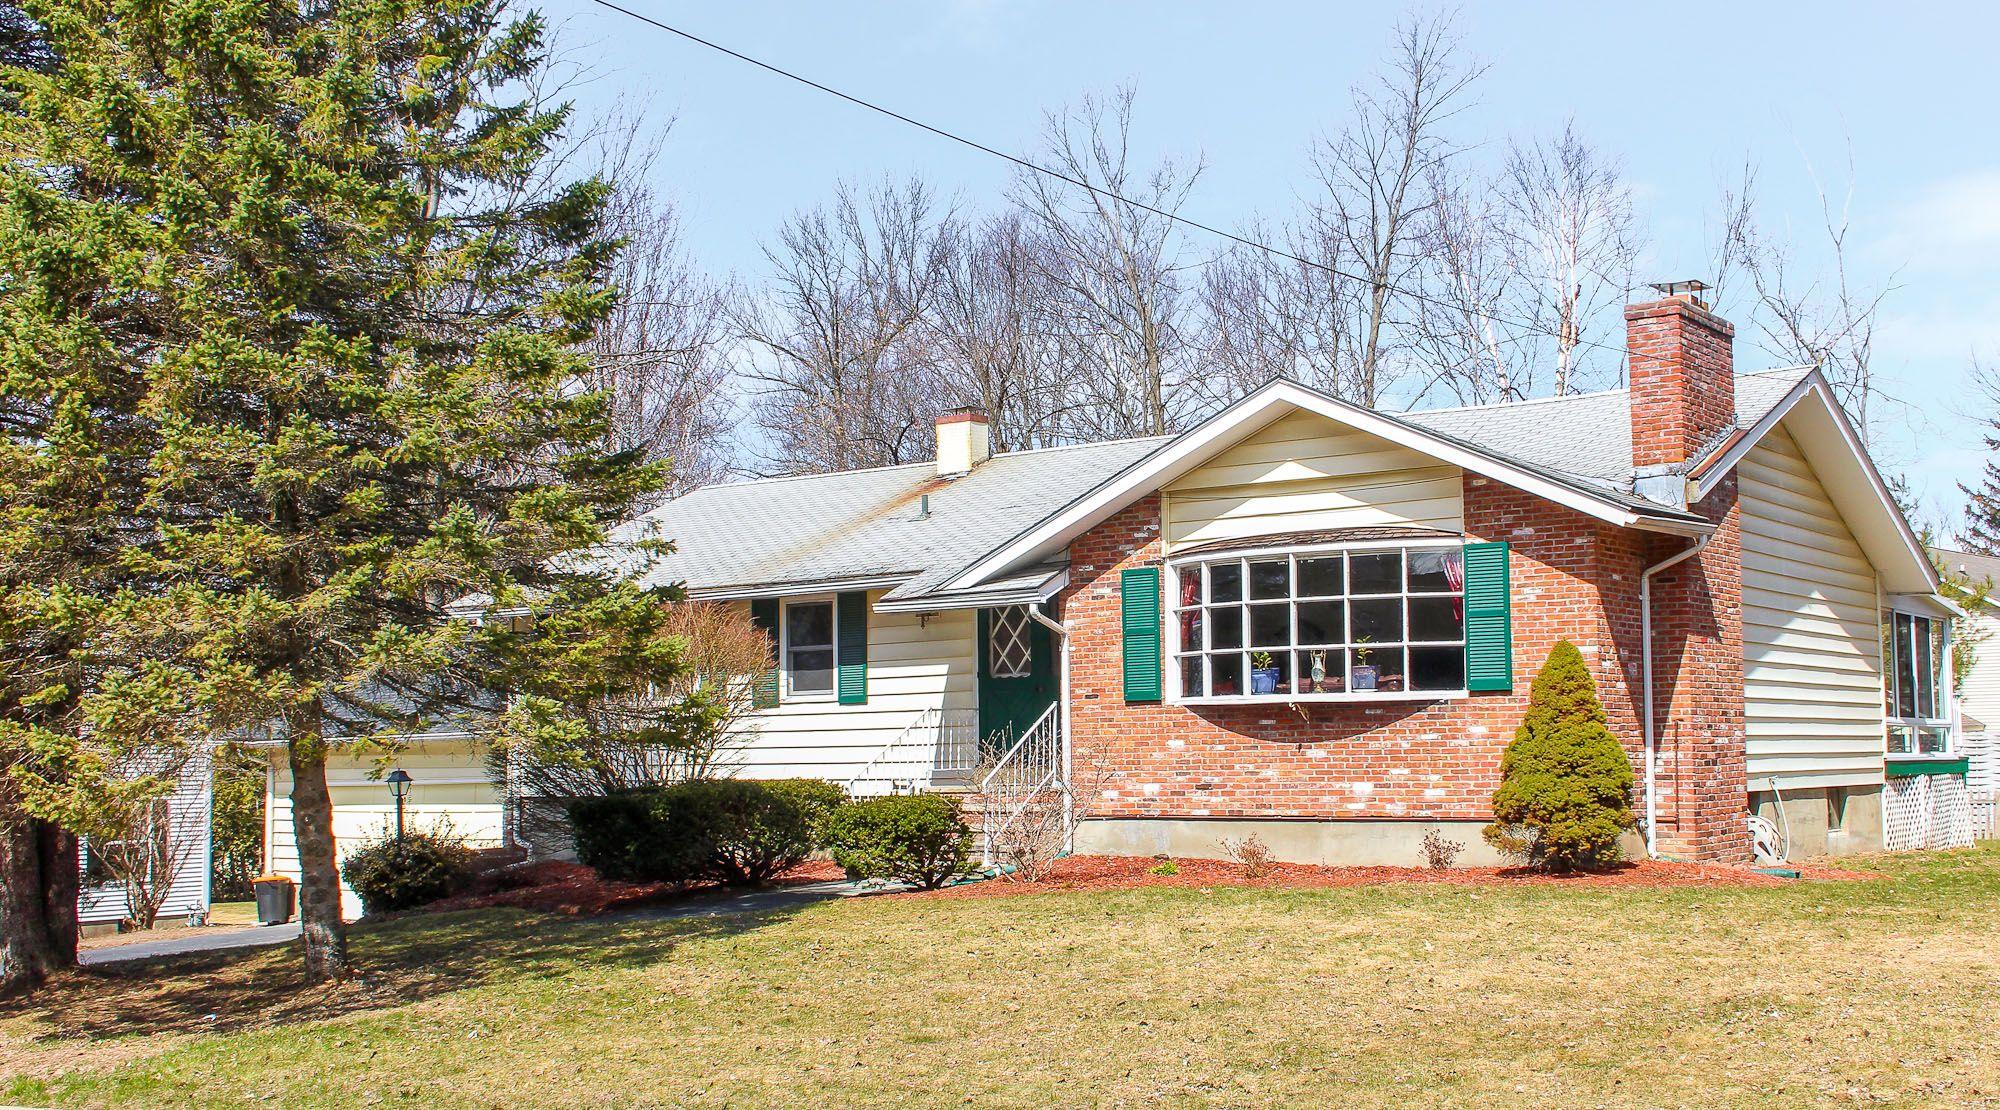 3 season porch window ideas   imperial drive south burlington vt   pantry closet real